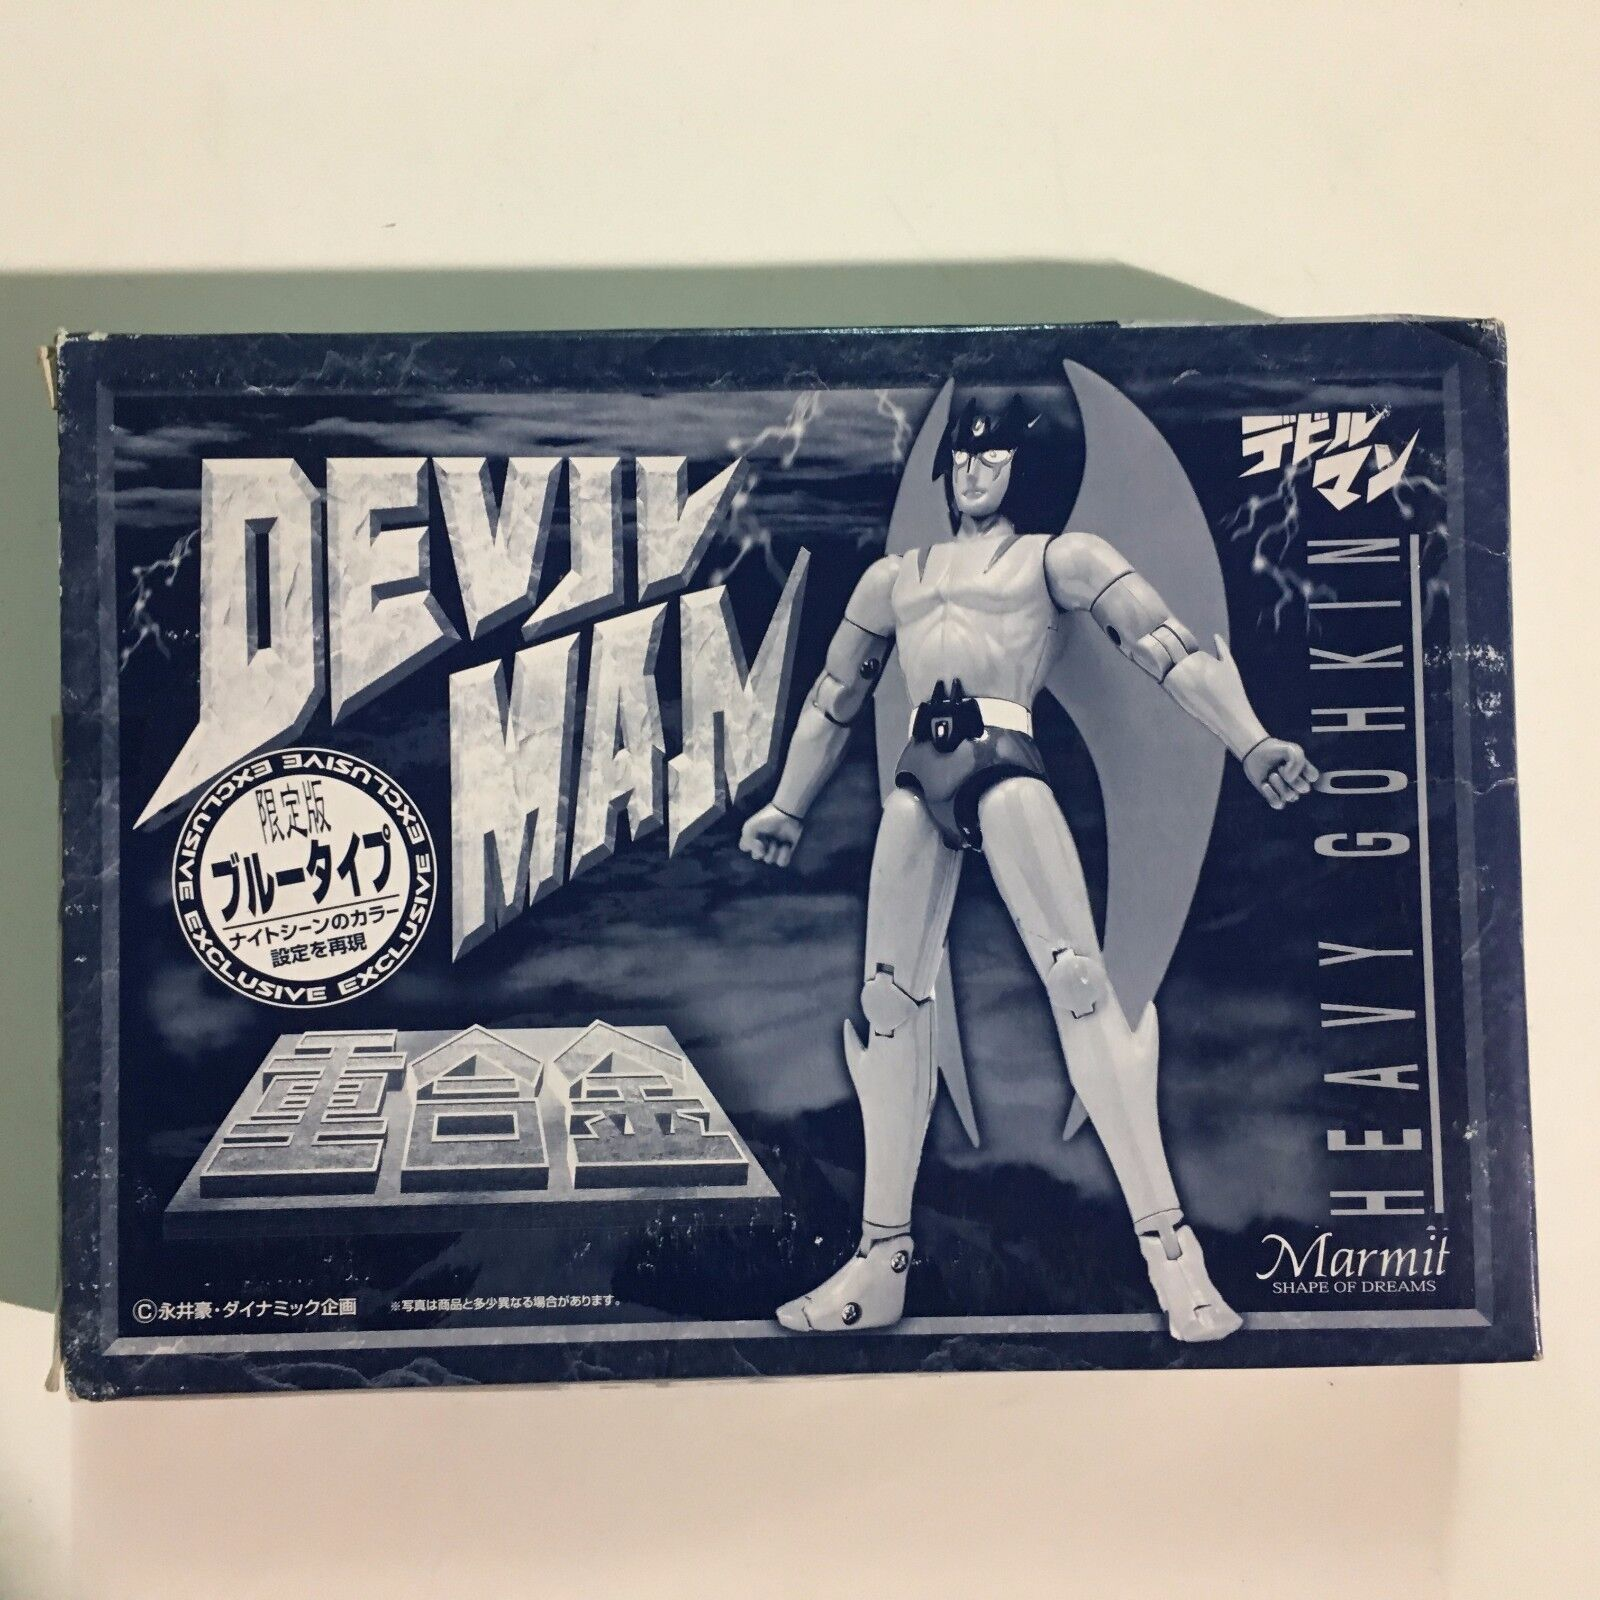 Deviluomo devil  Men Marmit Soul Chogokin Heavy Gohkin azione go nagai Metal blu  nuova esclusiva di fascia alta